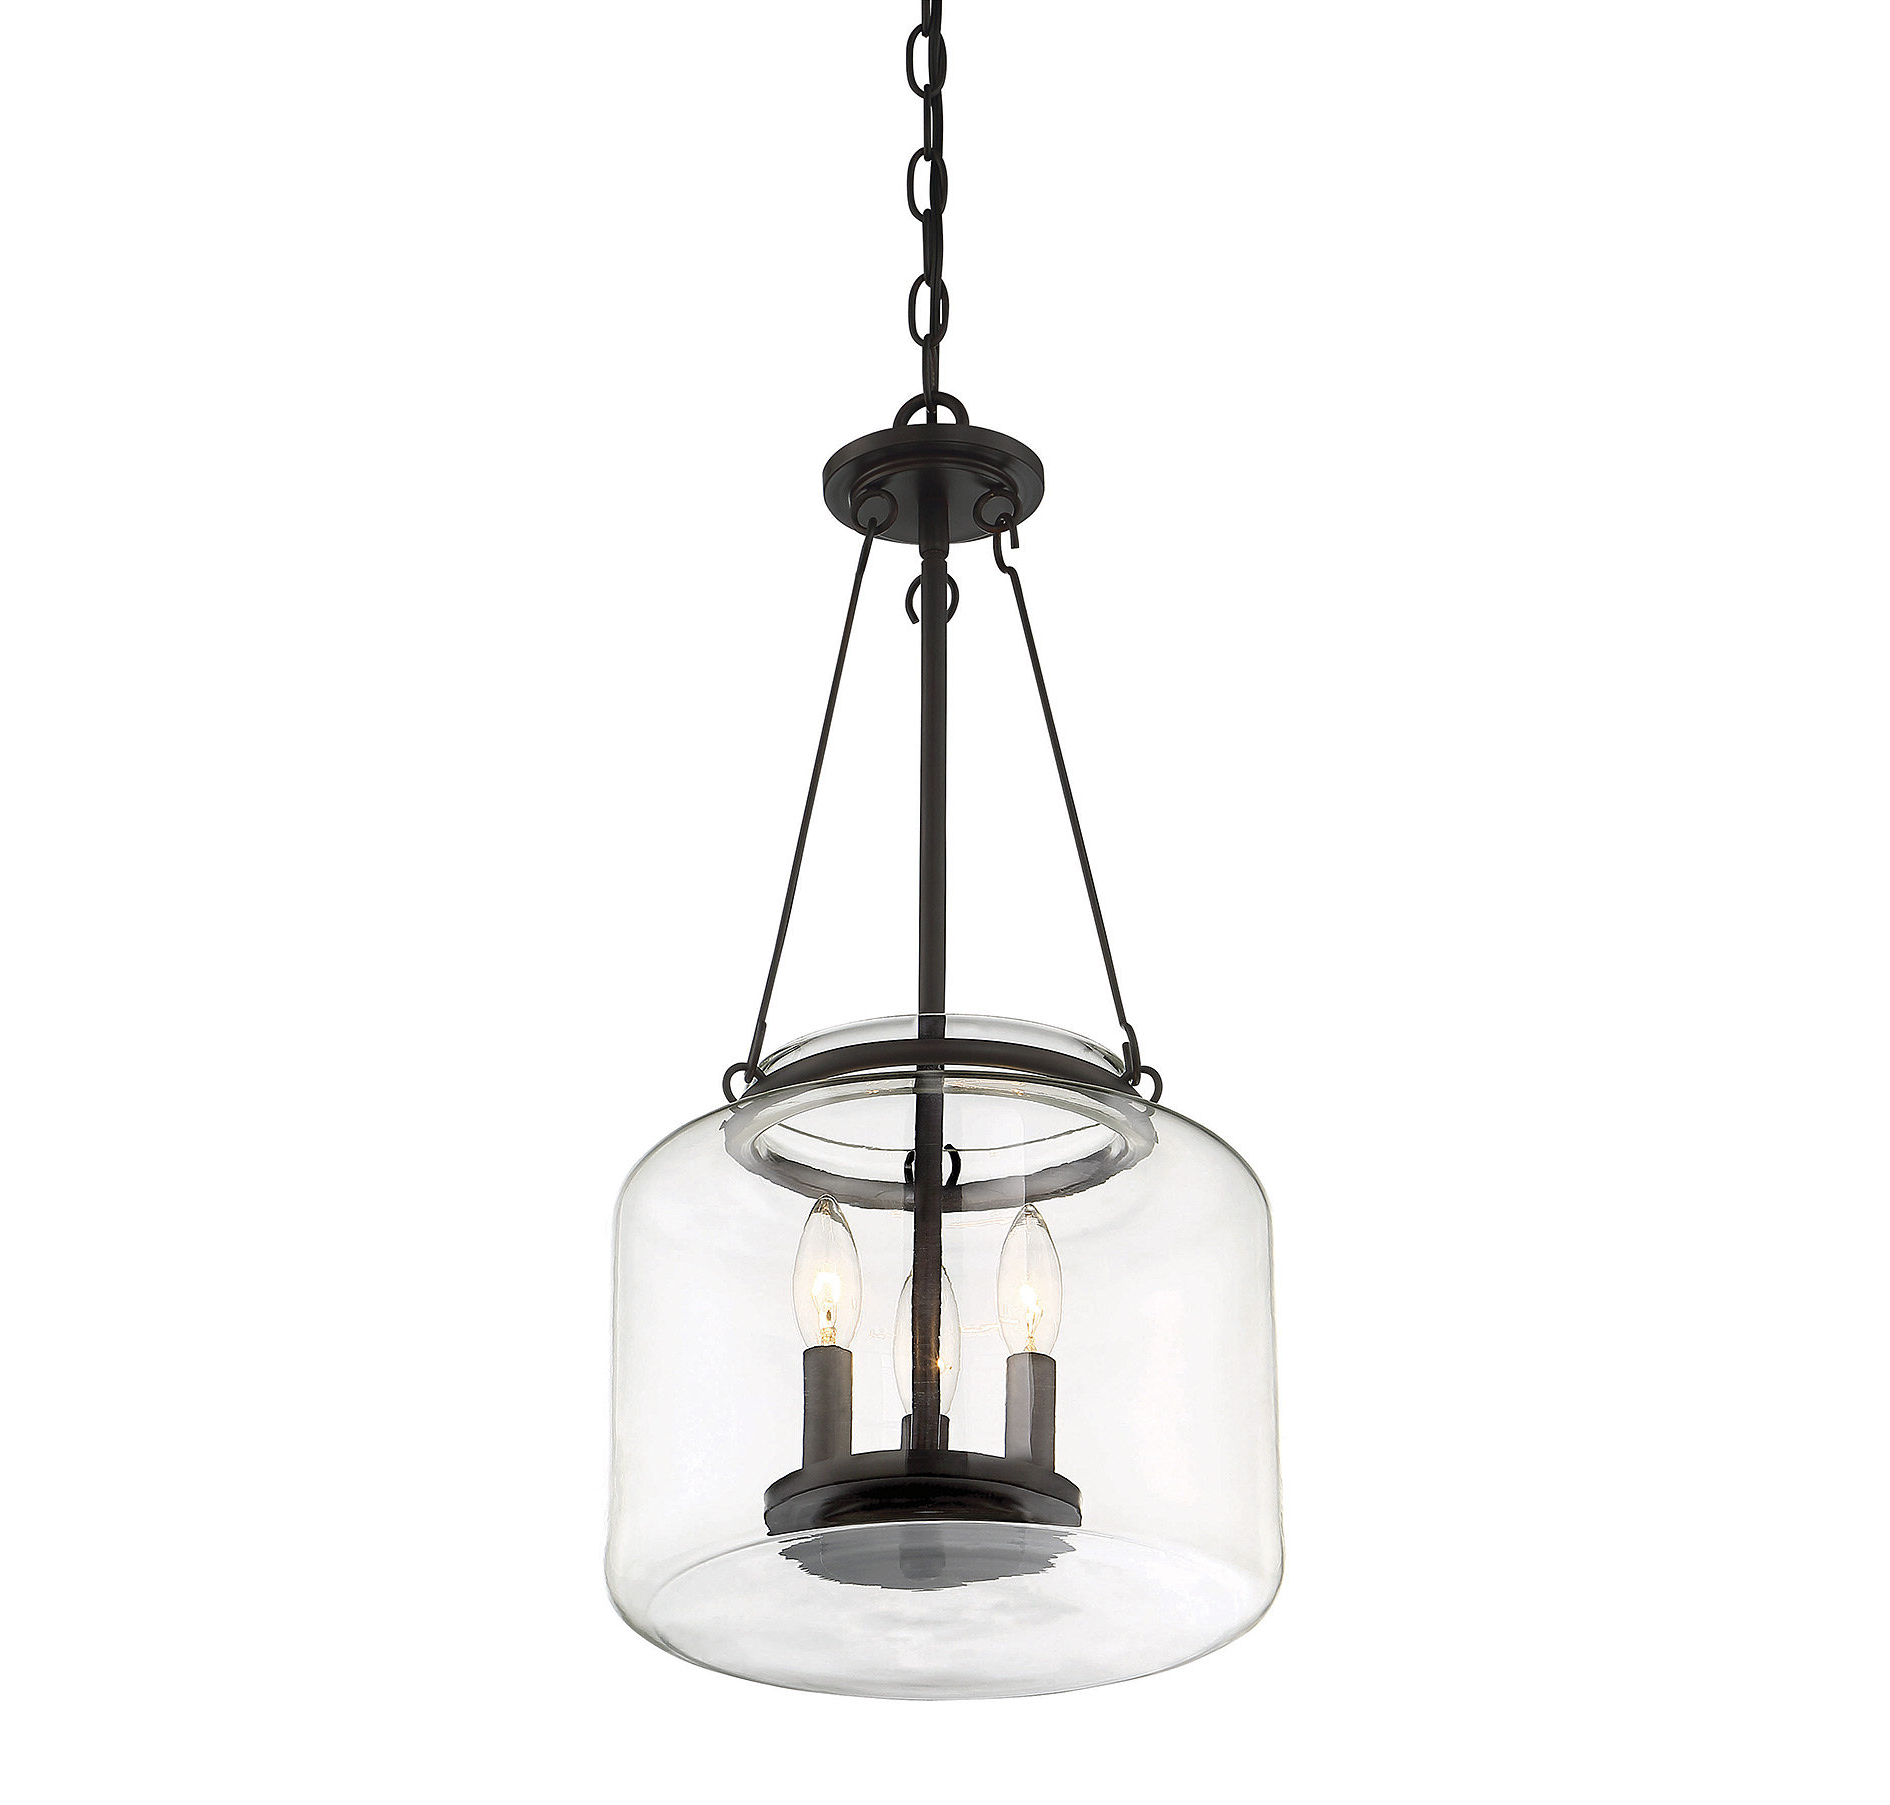 Best and Newest Tessie 3-Light Lantern Cylinder Pendants for Jean-Baptiste 3-Light Lantern Jar Pendant